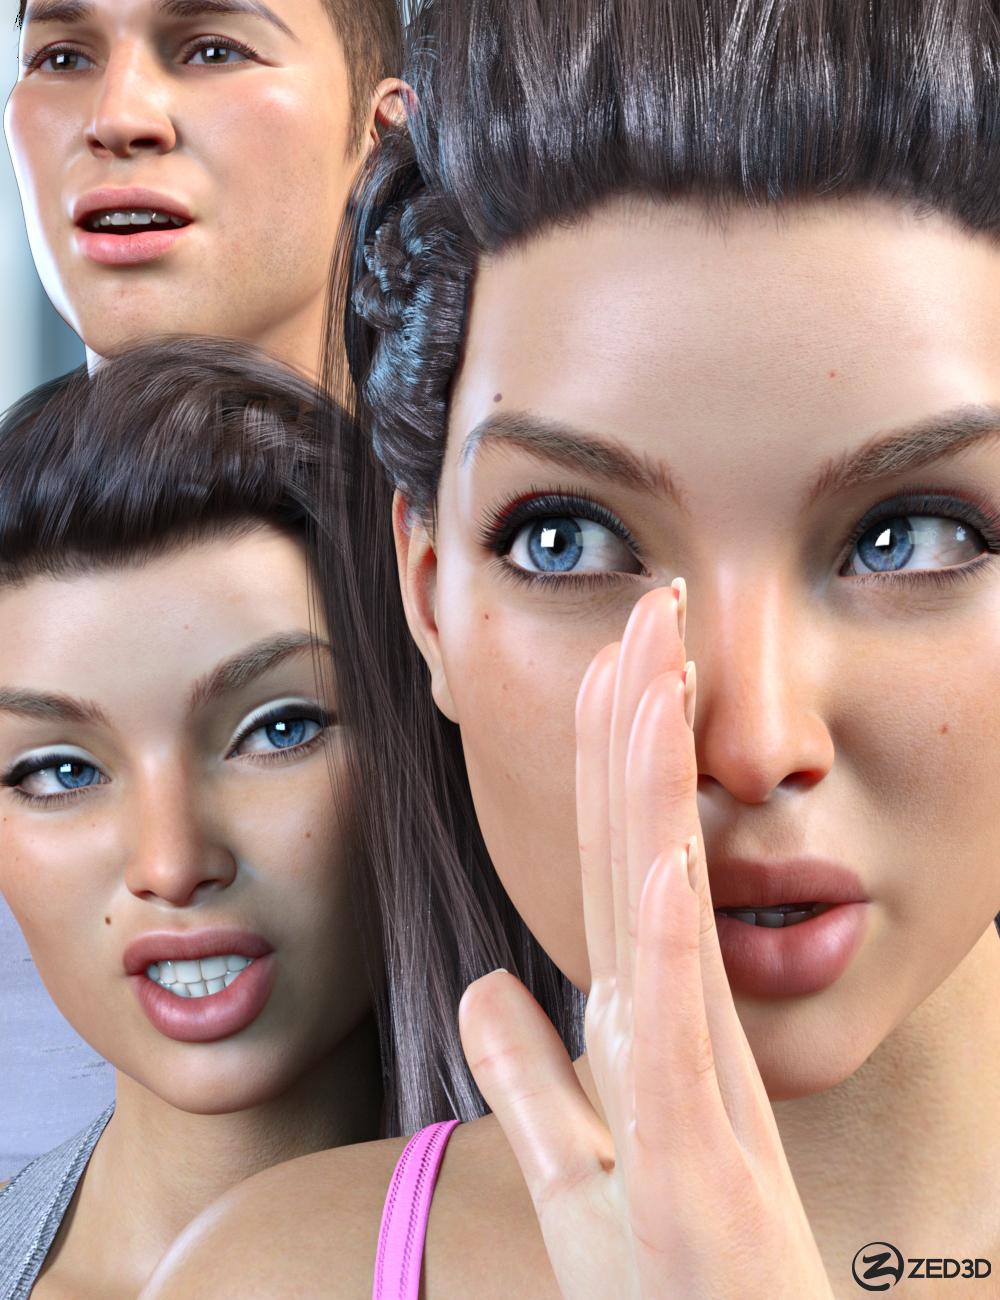 Z Conversation Mix and Match Expressions for Genesis 8.1 by: Zeddicuss, 3D Models by Daz 3D